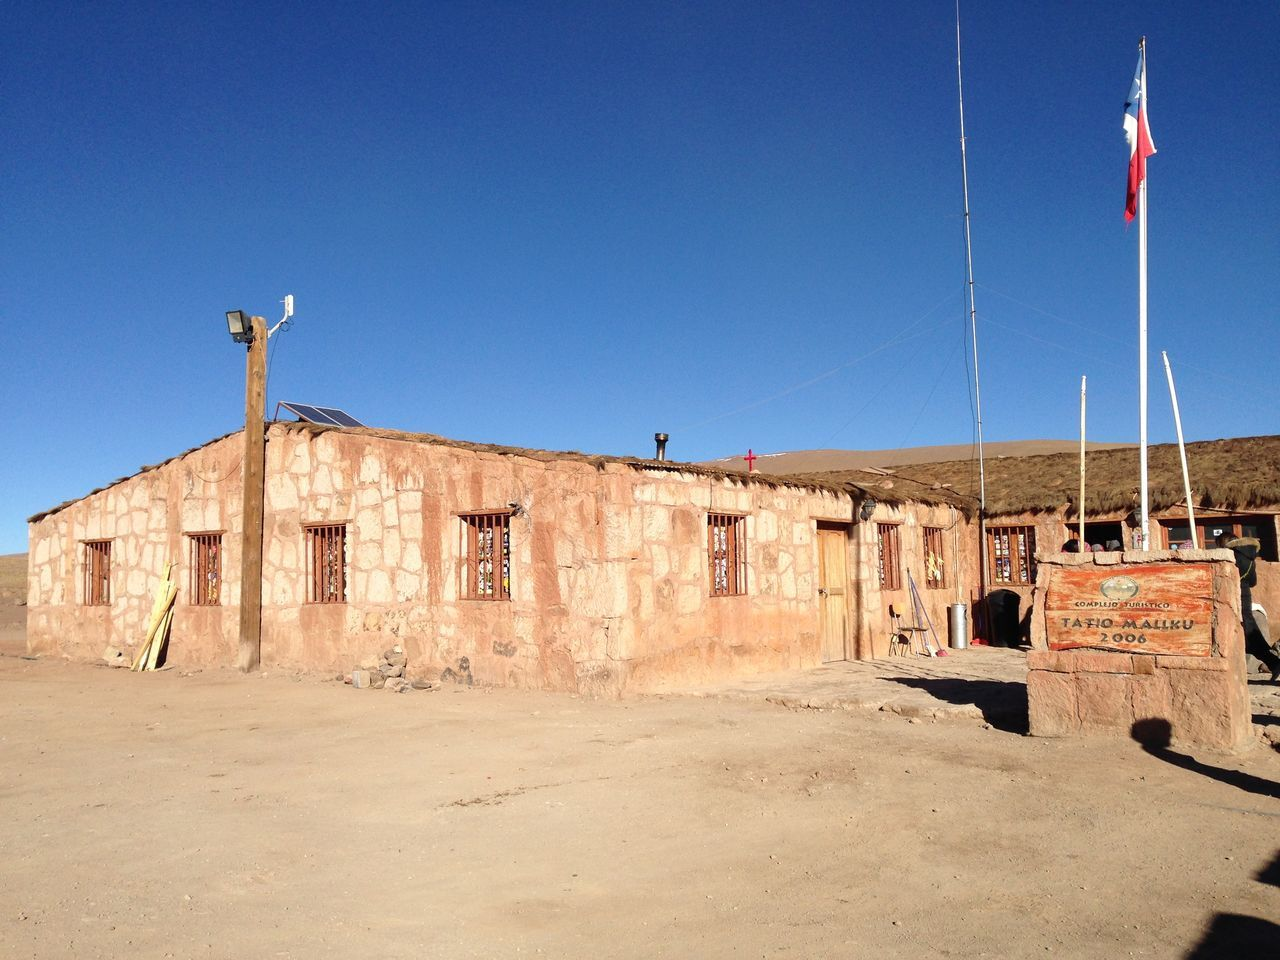 Old Church On Field At El Tatio Against Clear Blue Sky